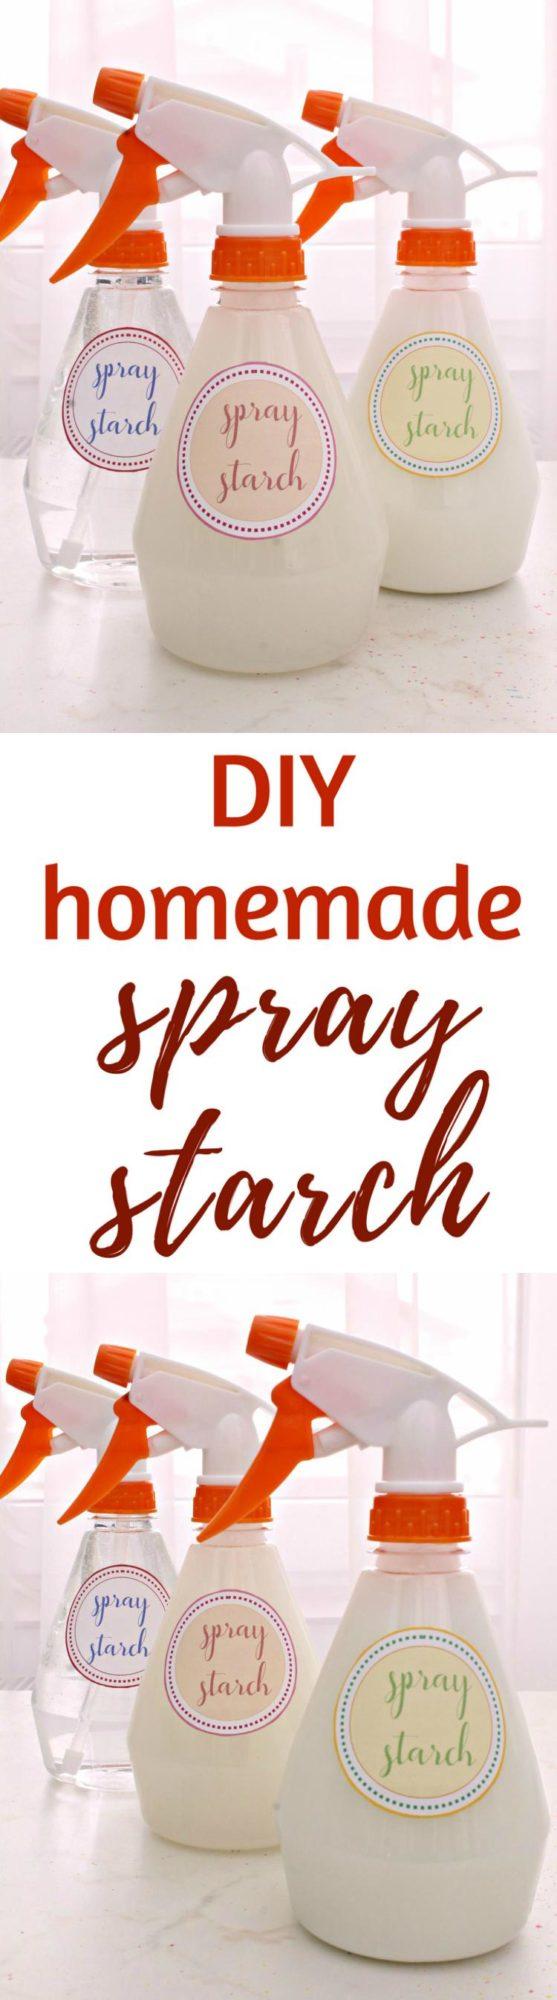 DIY spray starch